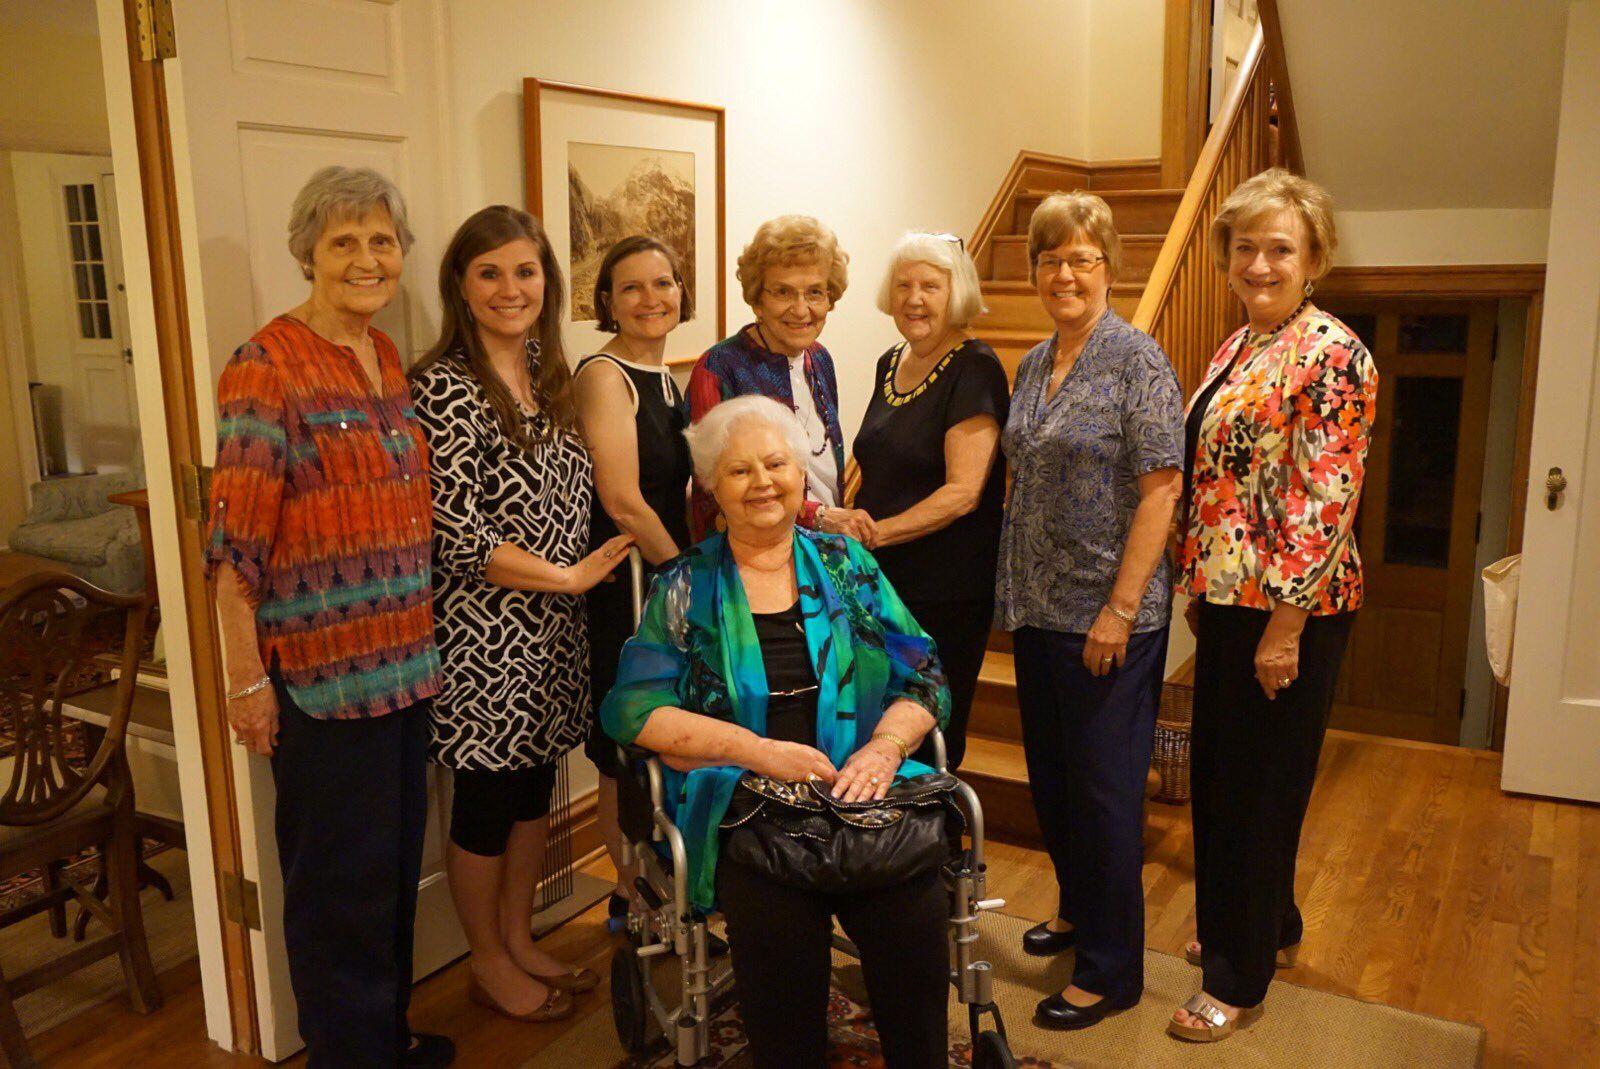 "Eagle Forum on Twitter: ""EF members Eunie Smith, Glyn Wright, Anne Schlafly Cori, Rosina Kovar, Shirley Curry, Carolyn McLarty, Cathie Adams, & Pat Andrews seated https://t.co/2sedDAOLKD"""